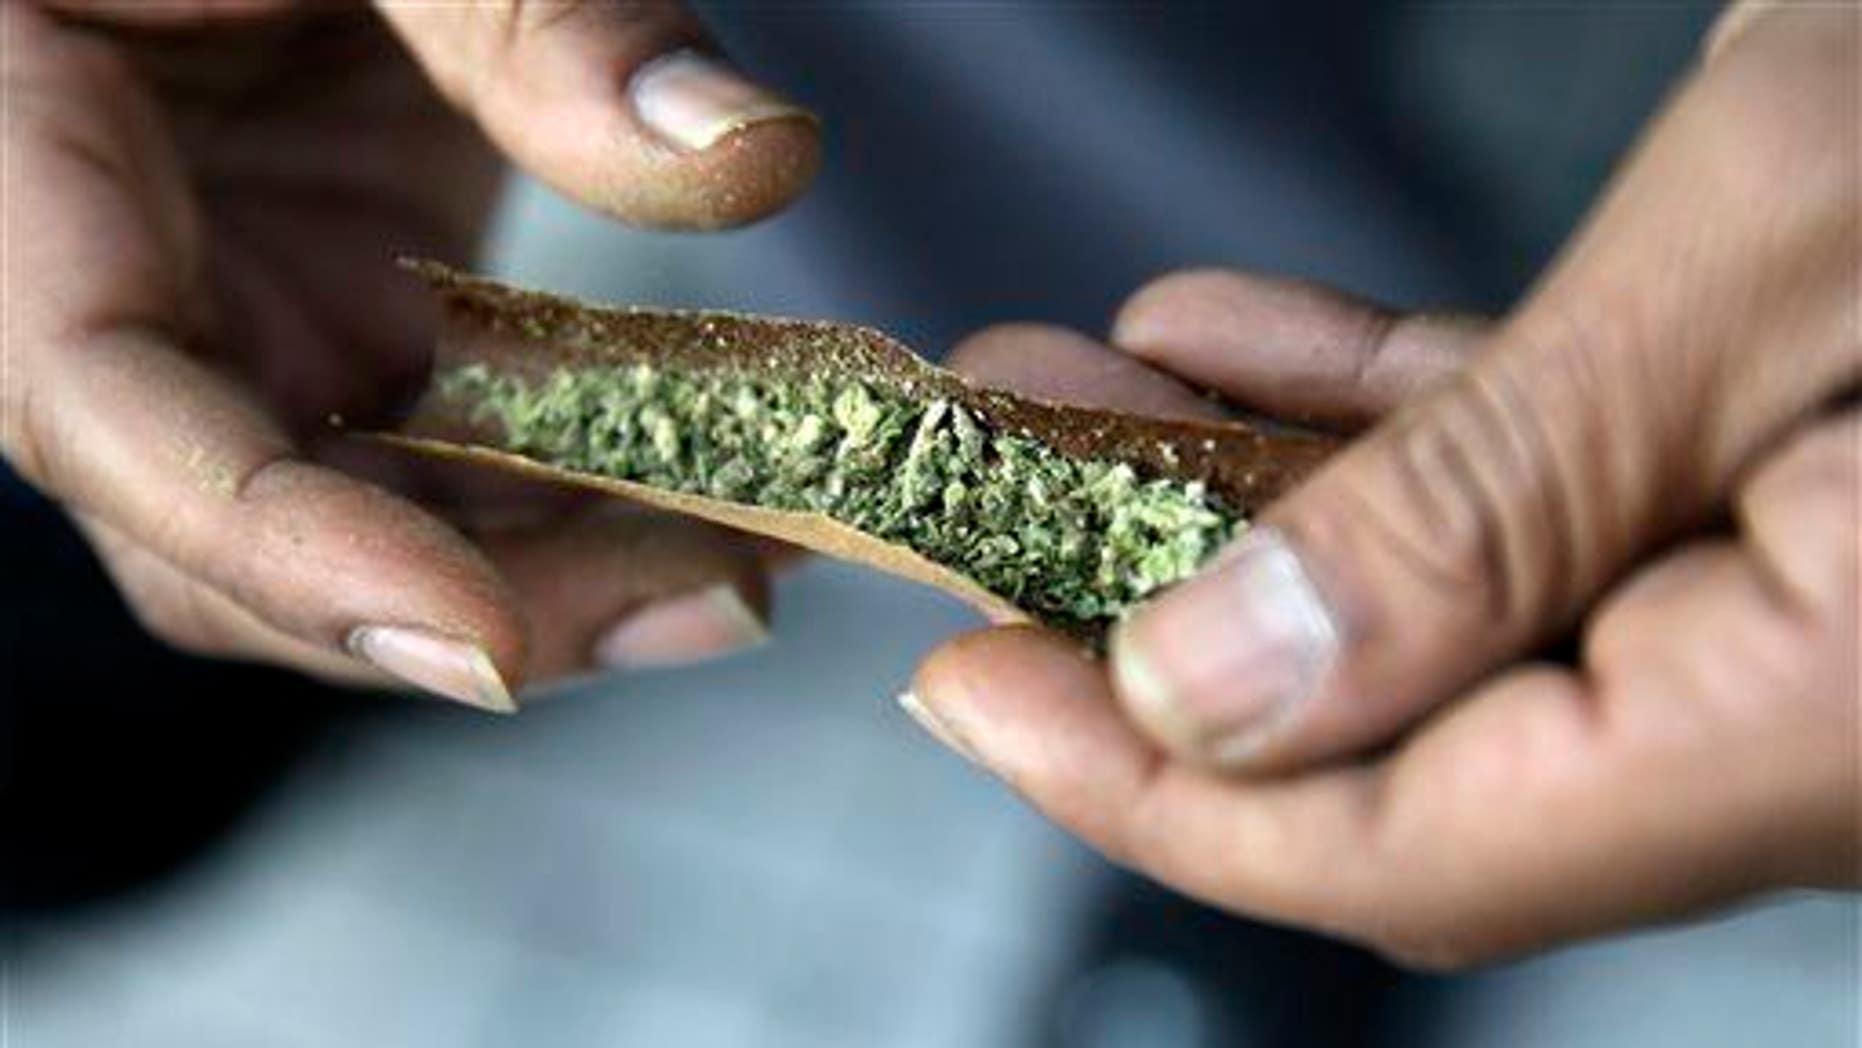 A man rolls a marijuana cigarette on Saturday, March 21, 2015, in Trenton, N.J.